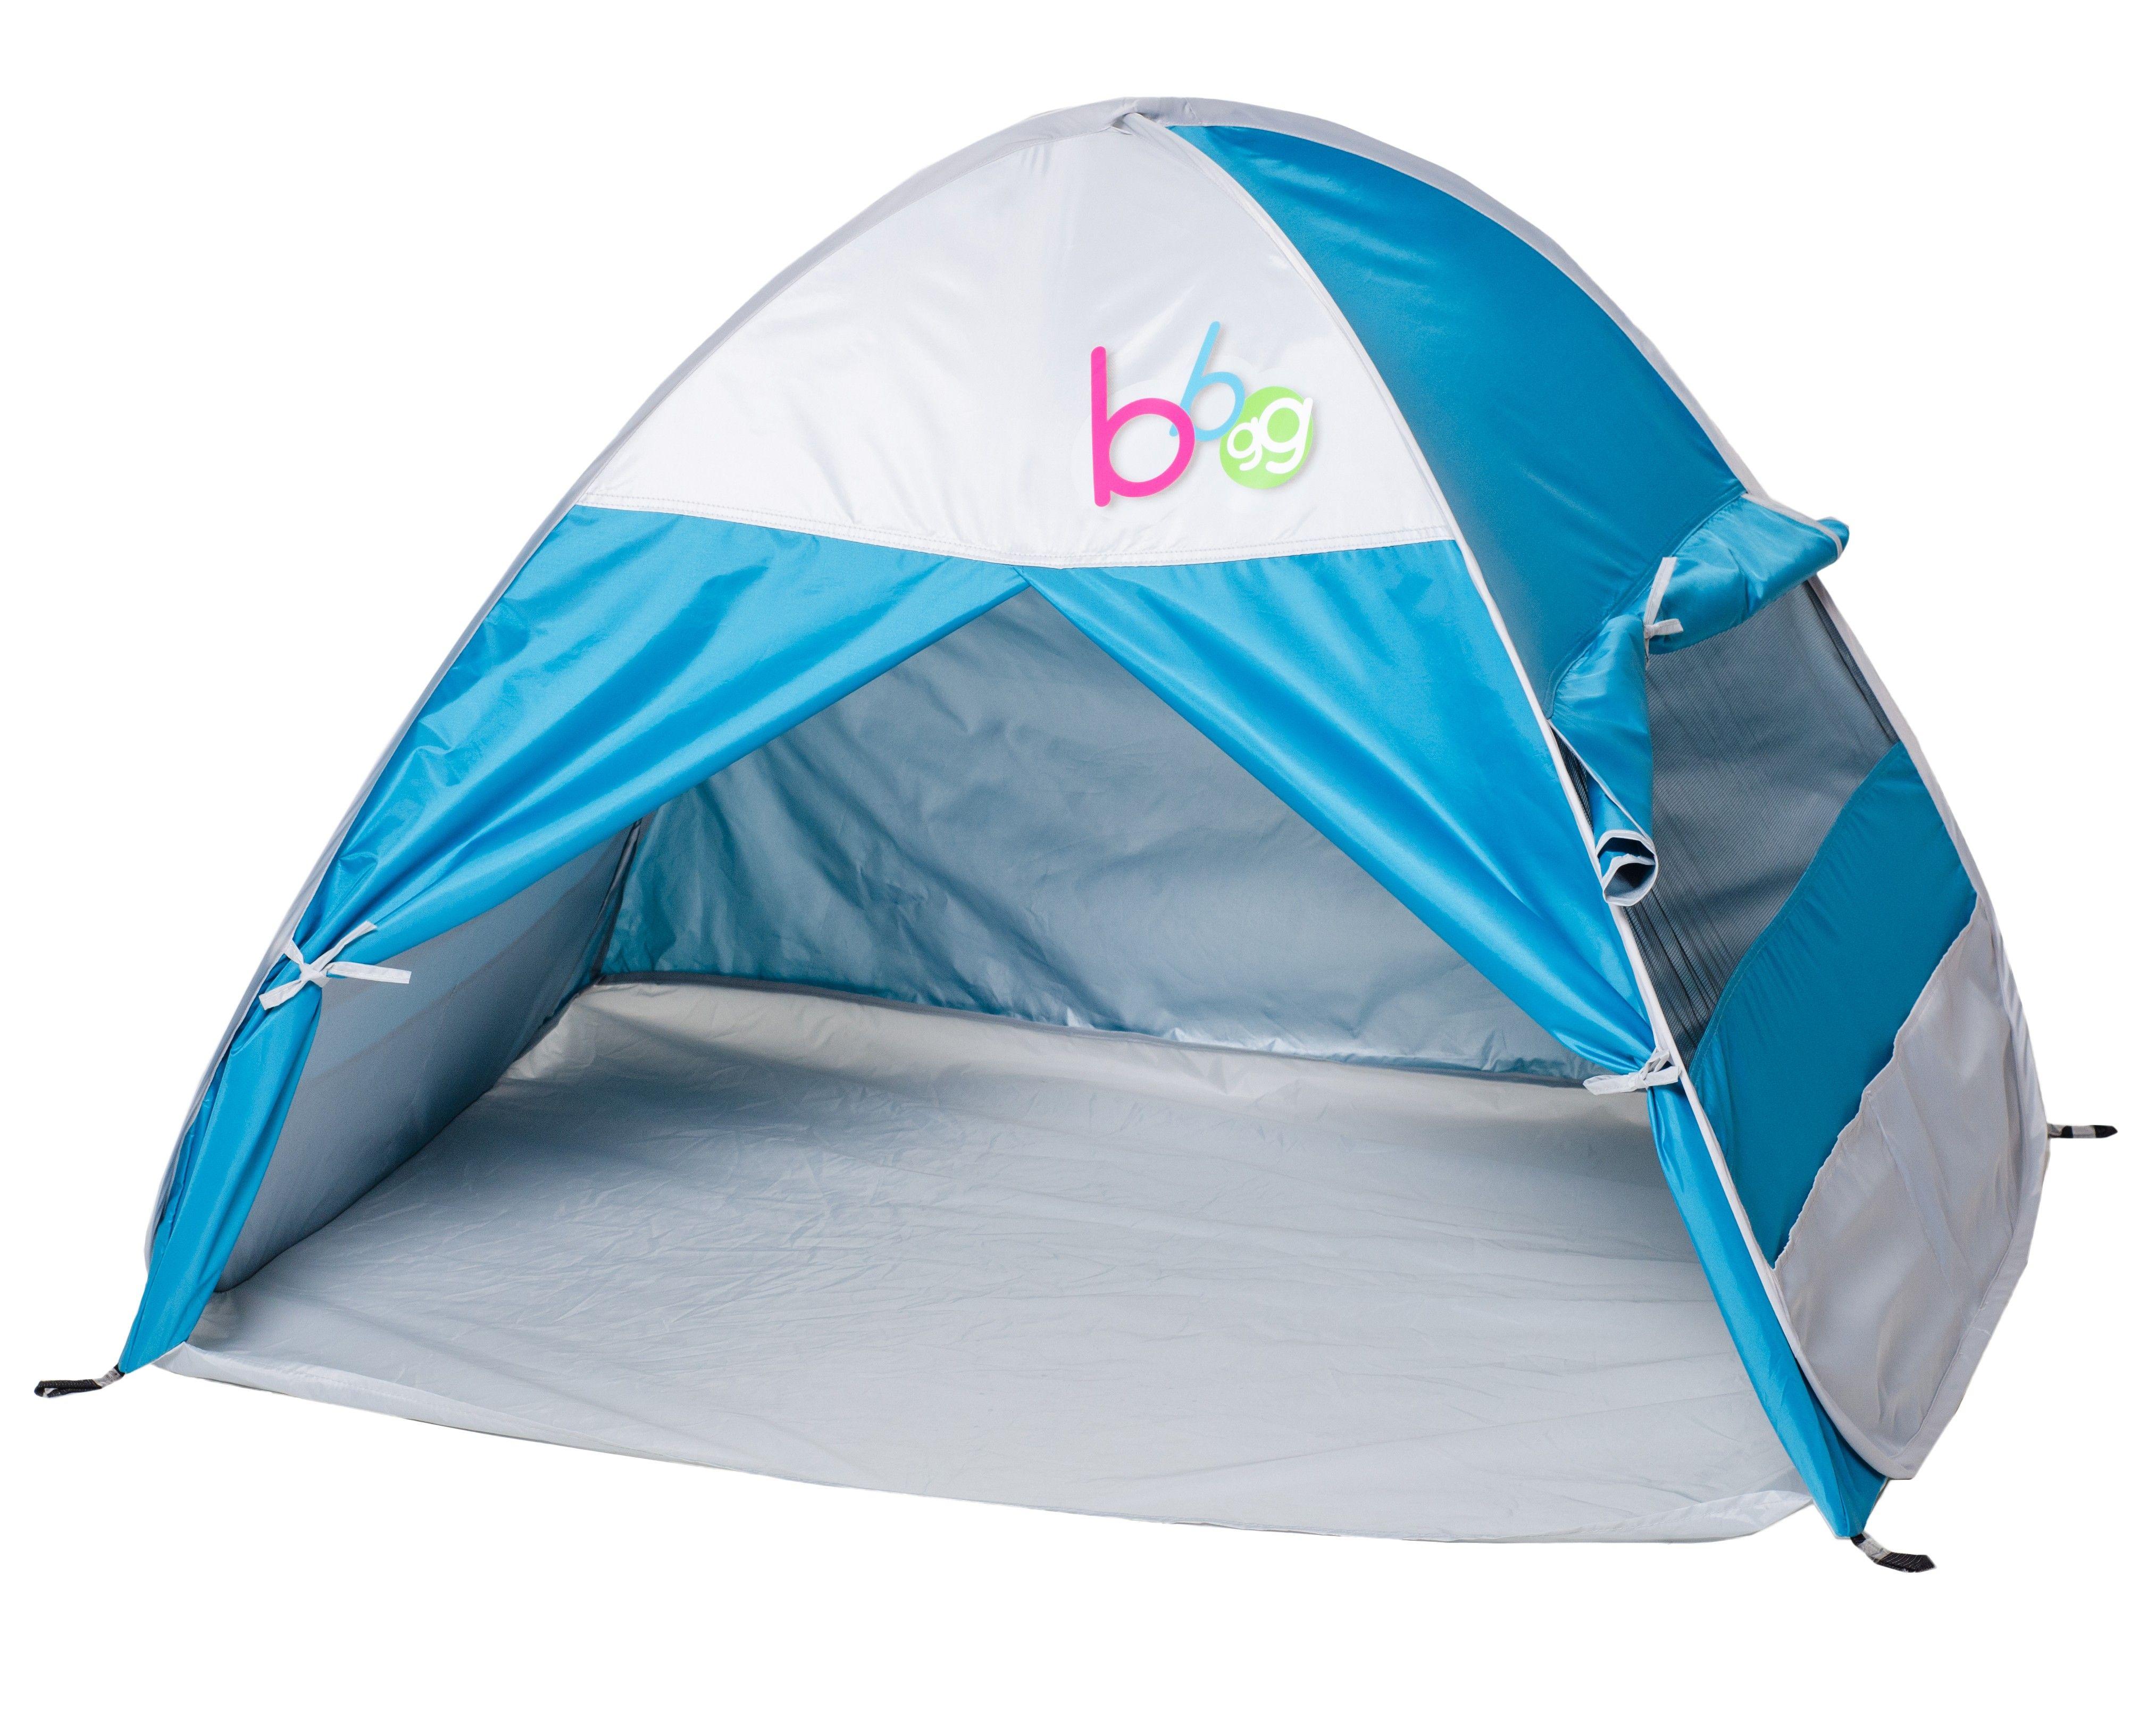 Infant Sun Cabana Blue Pop Up Beach Shelter Tente Uv The Baby Factory